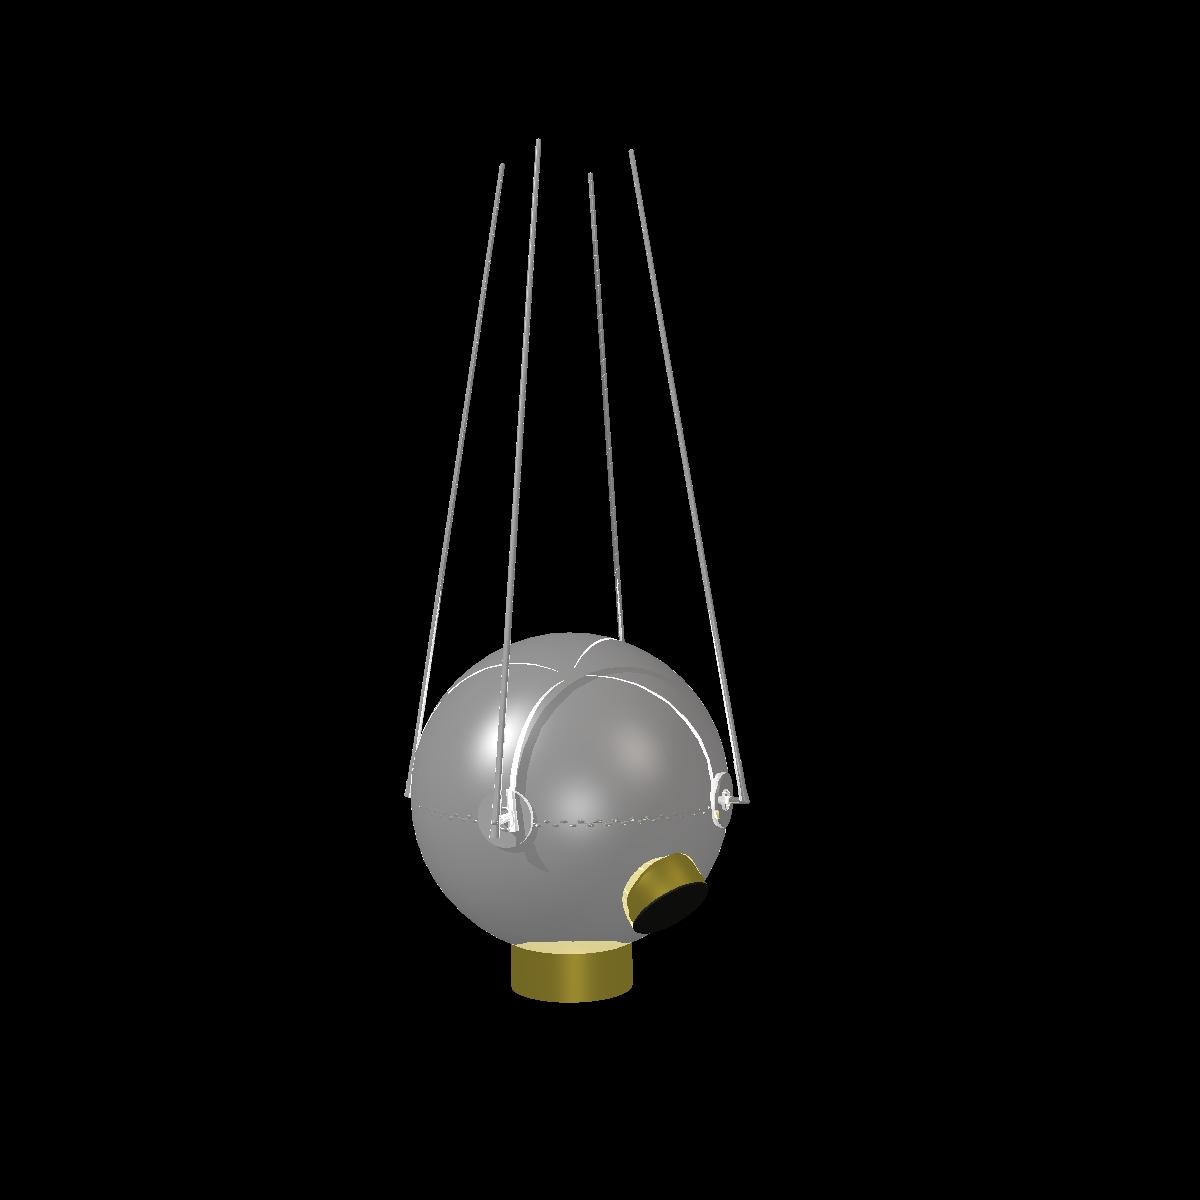 avangard ii satelit 3d model 3ds dxf fbx mješavina cob dae x obj 163942